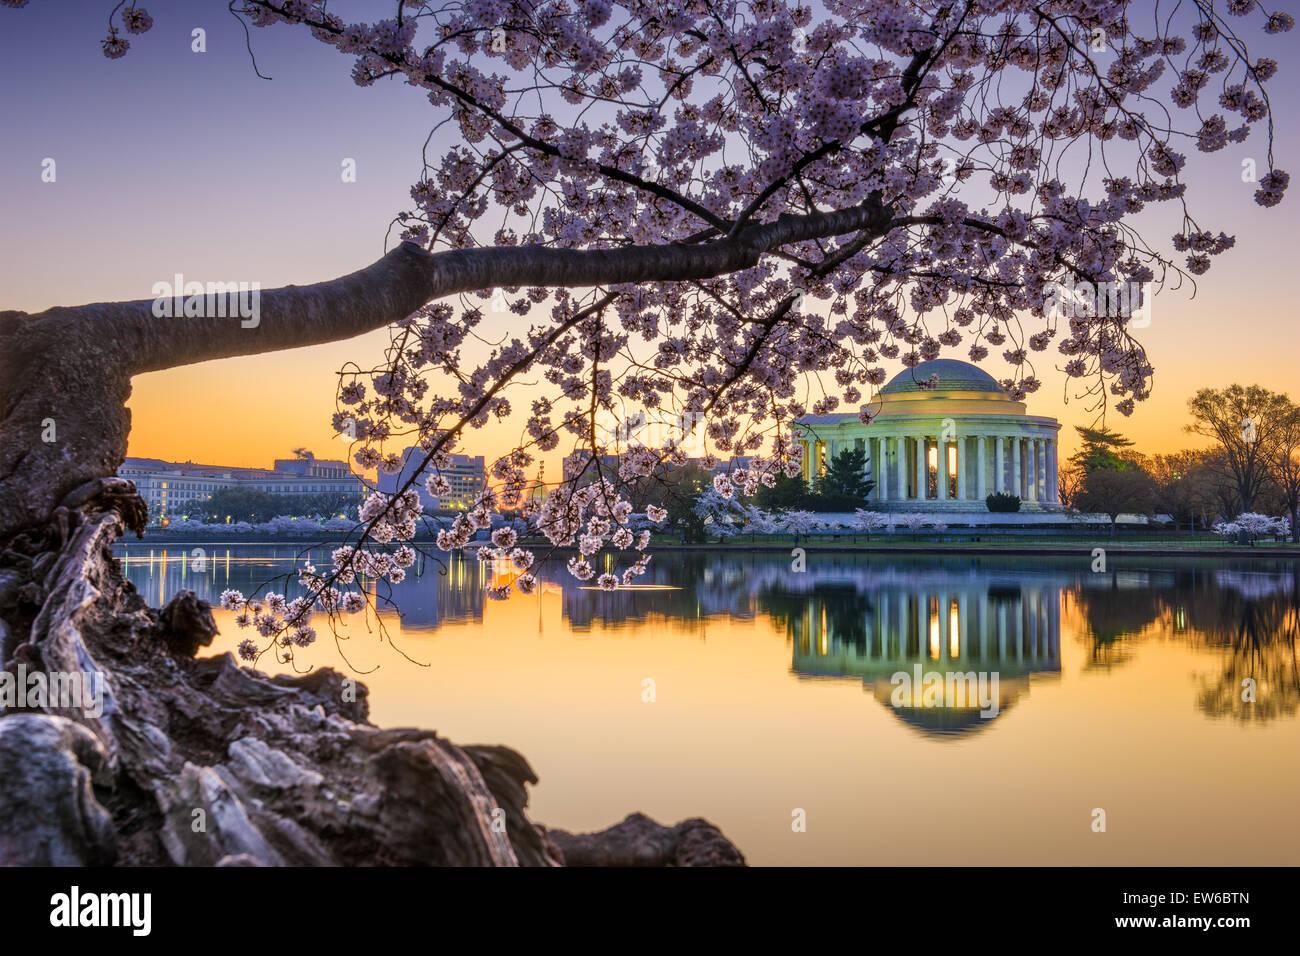 Washington, DC am Jefferson Memorial im Frühjahr. Stockbild